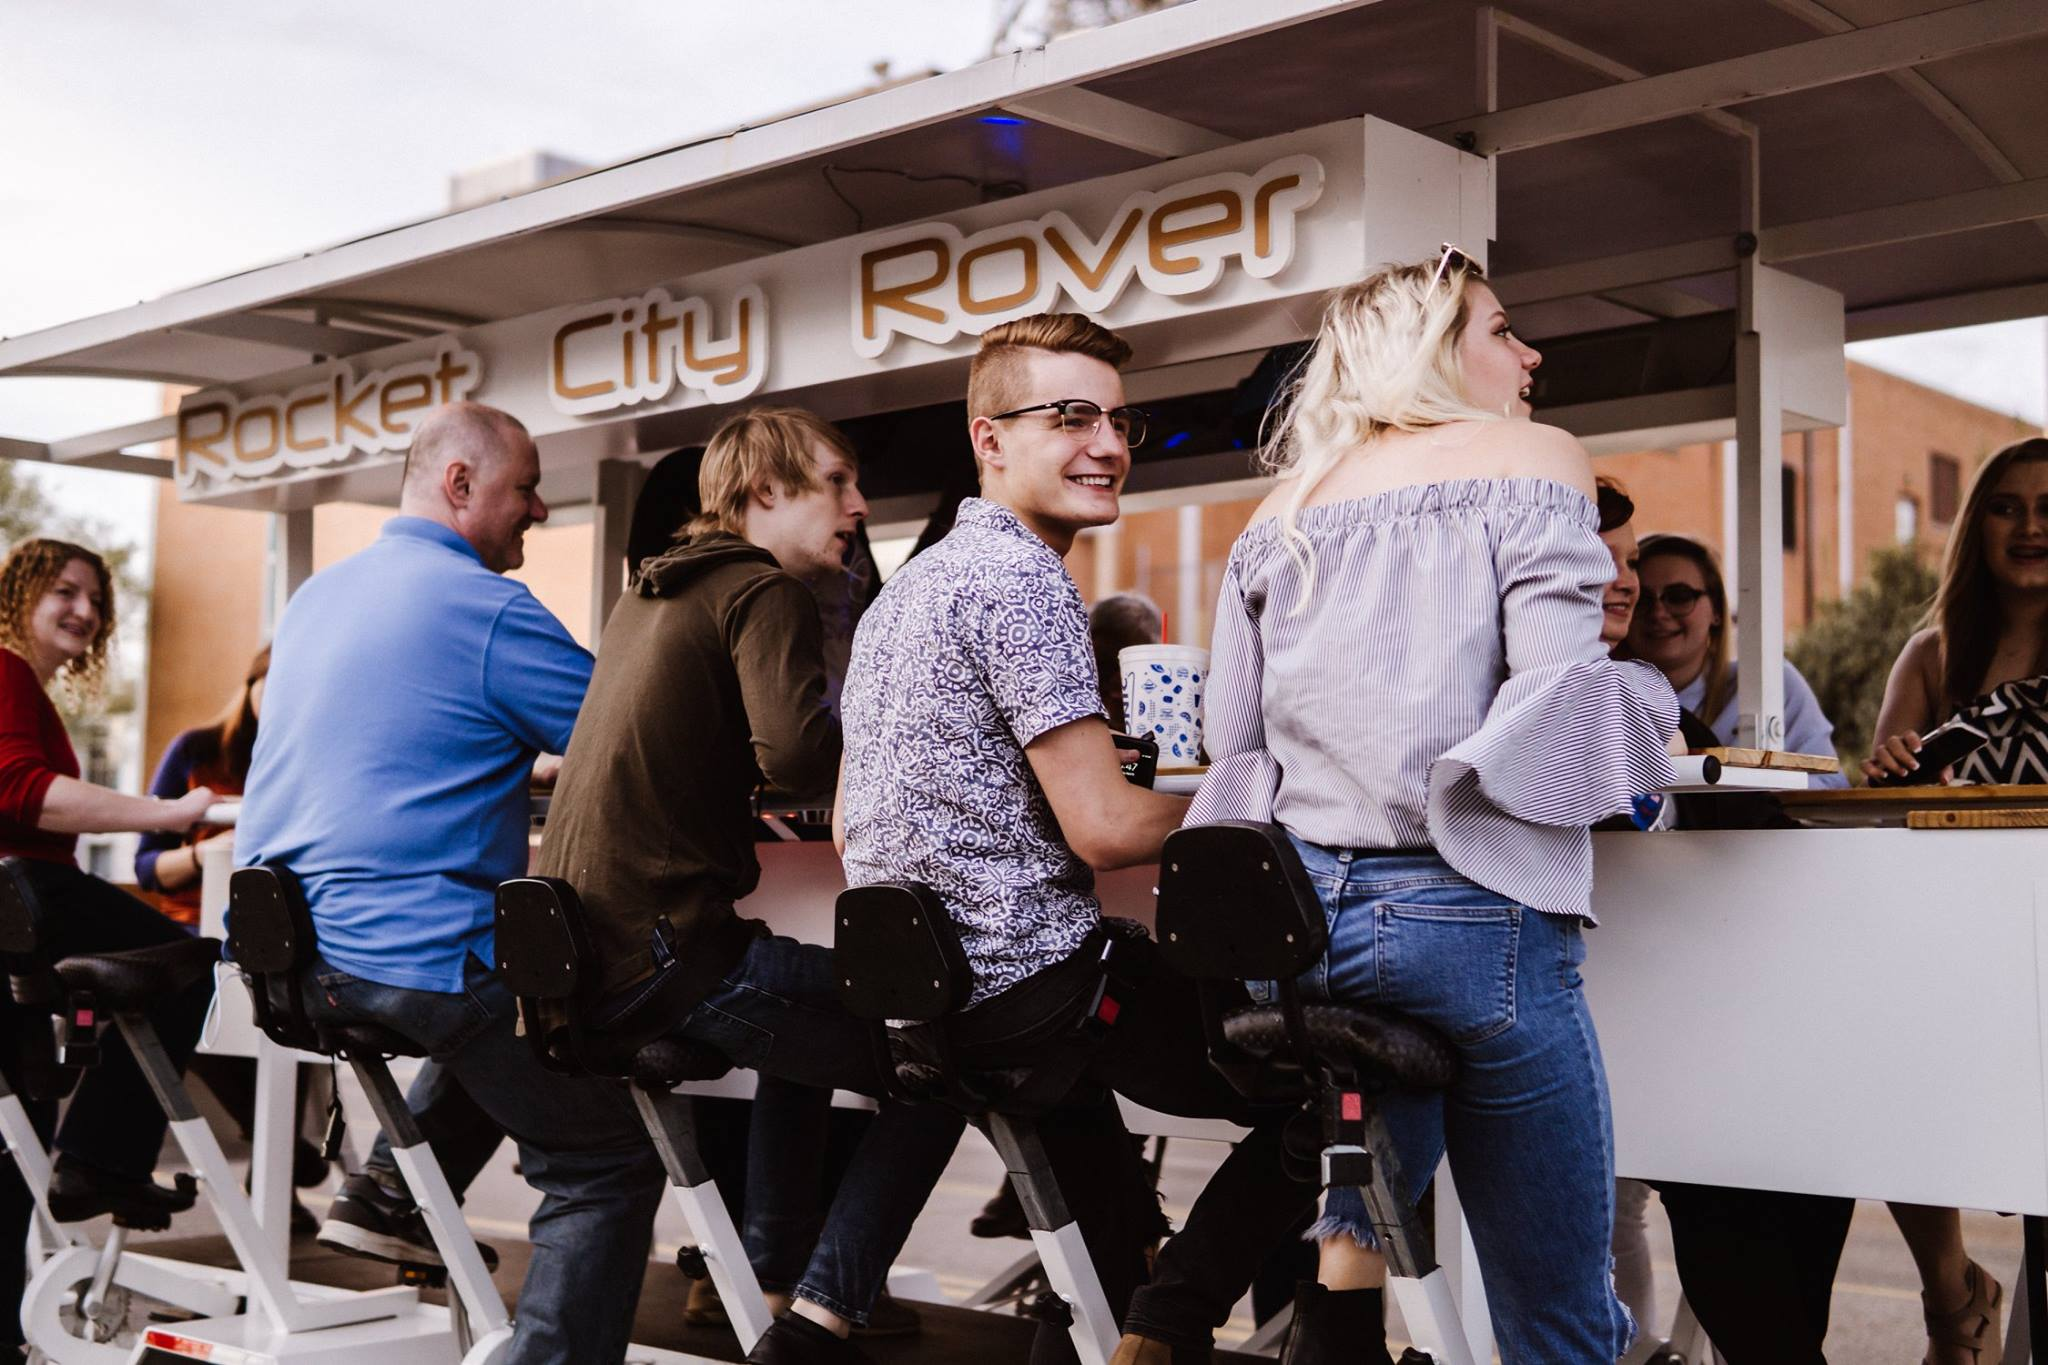 Rocket City Rover, LLC